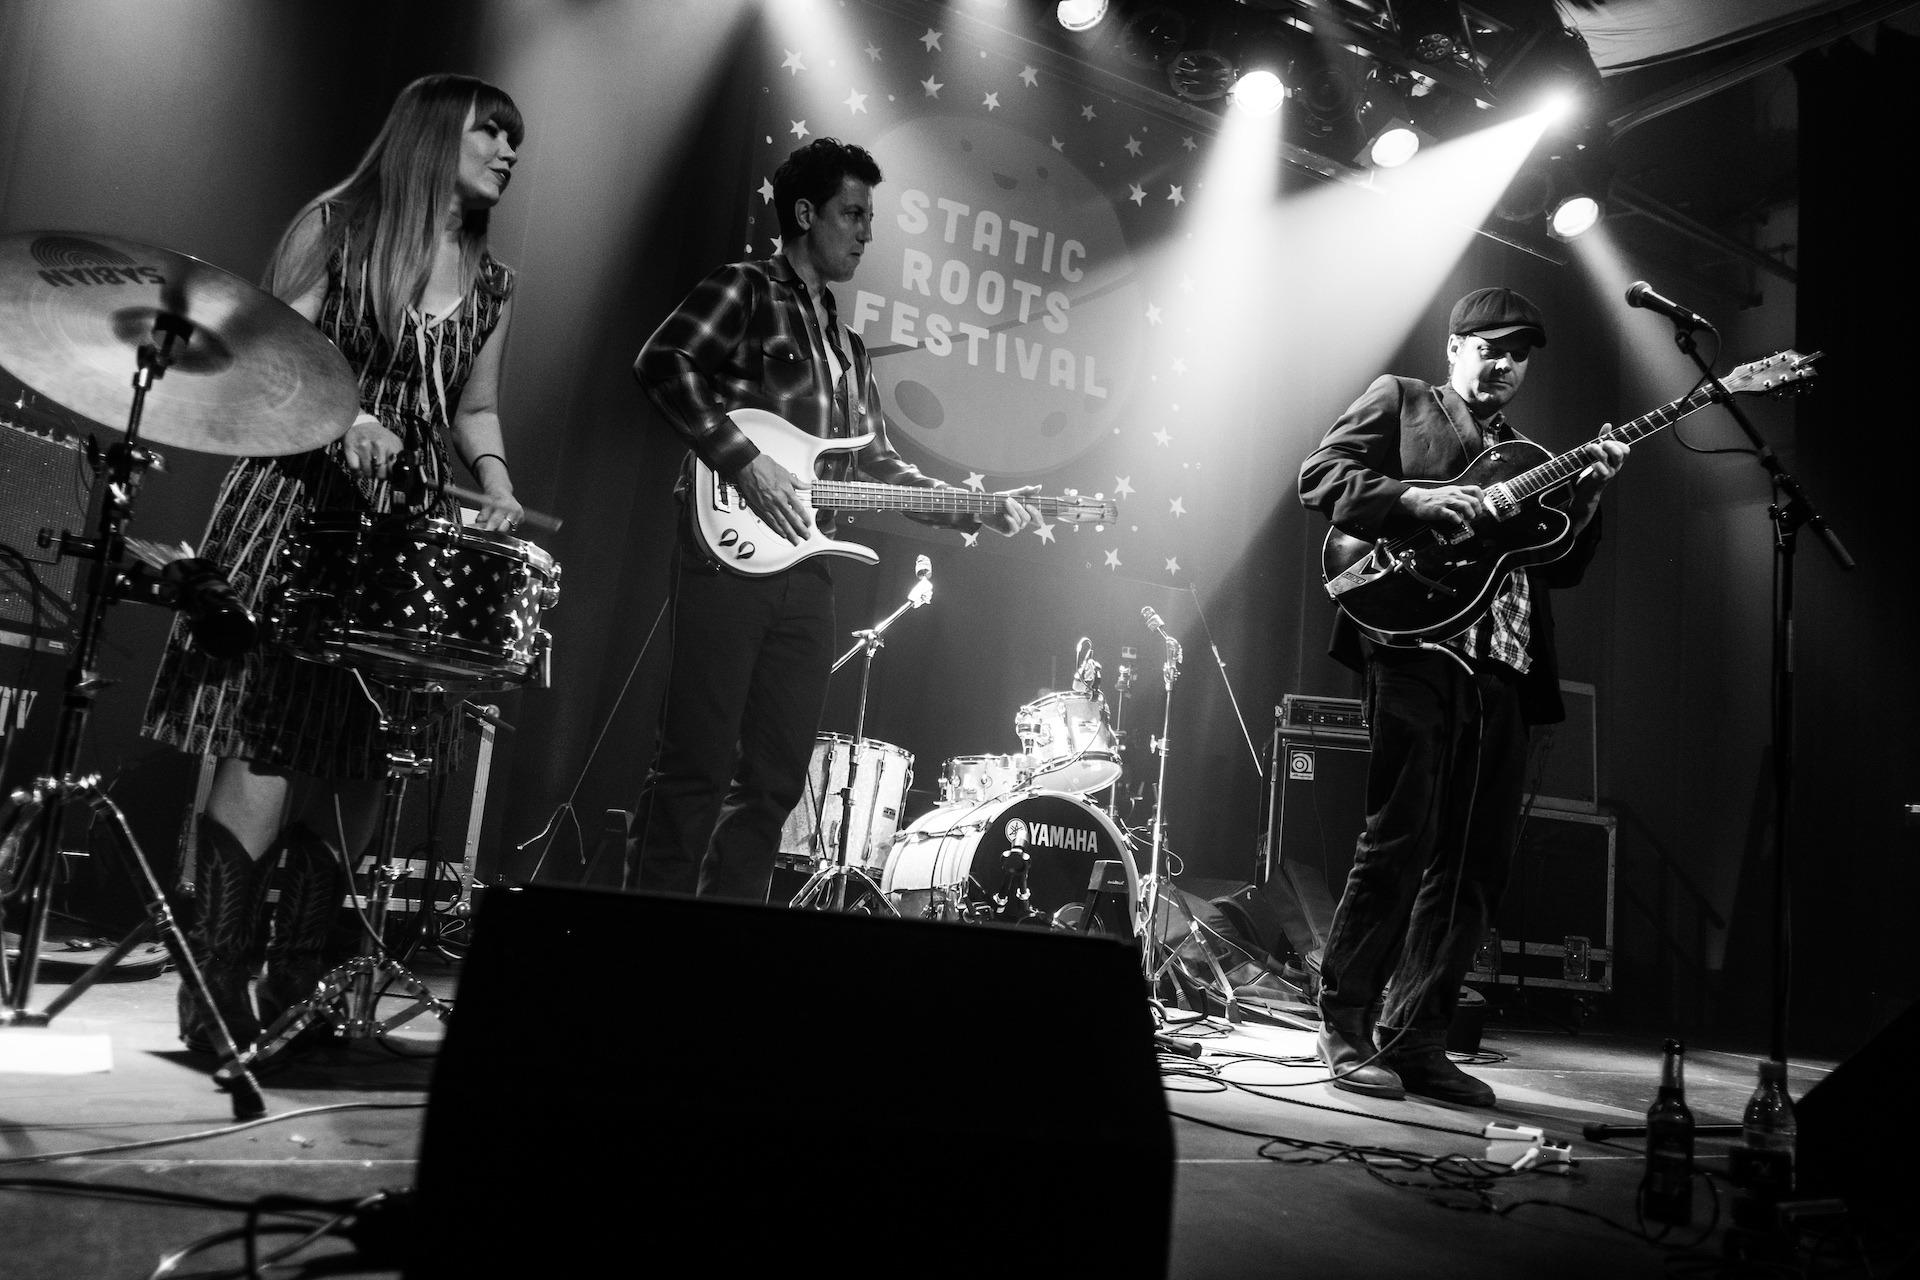 Static Roots Festival 2017 - Jack Marks, Leslie Ann Christl, Alistair Christl